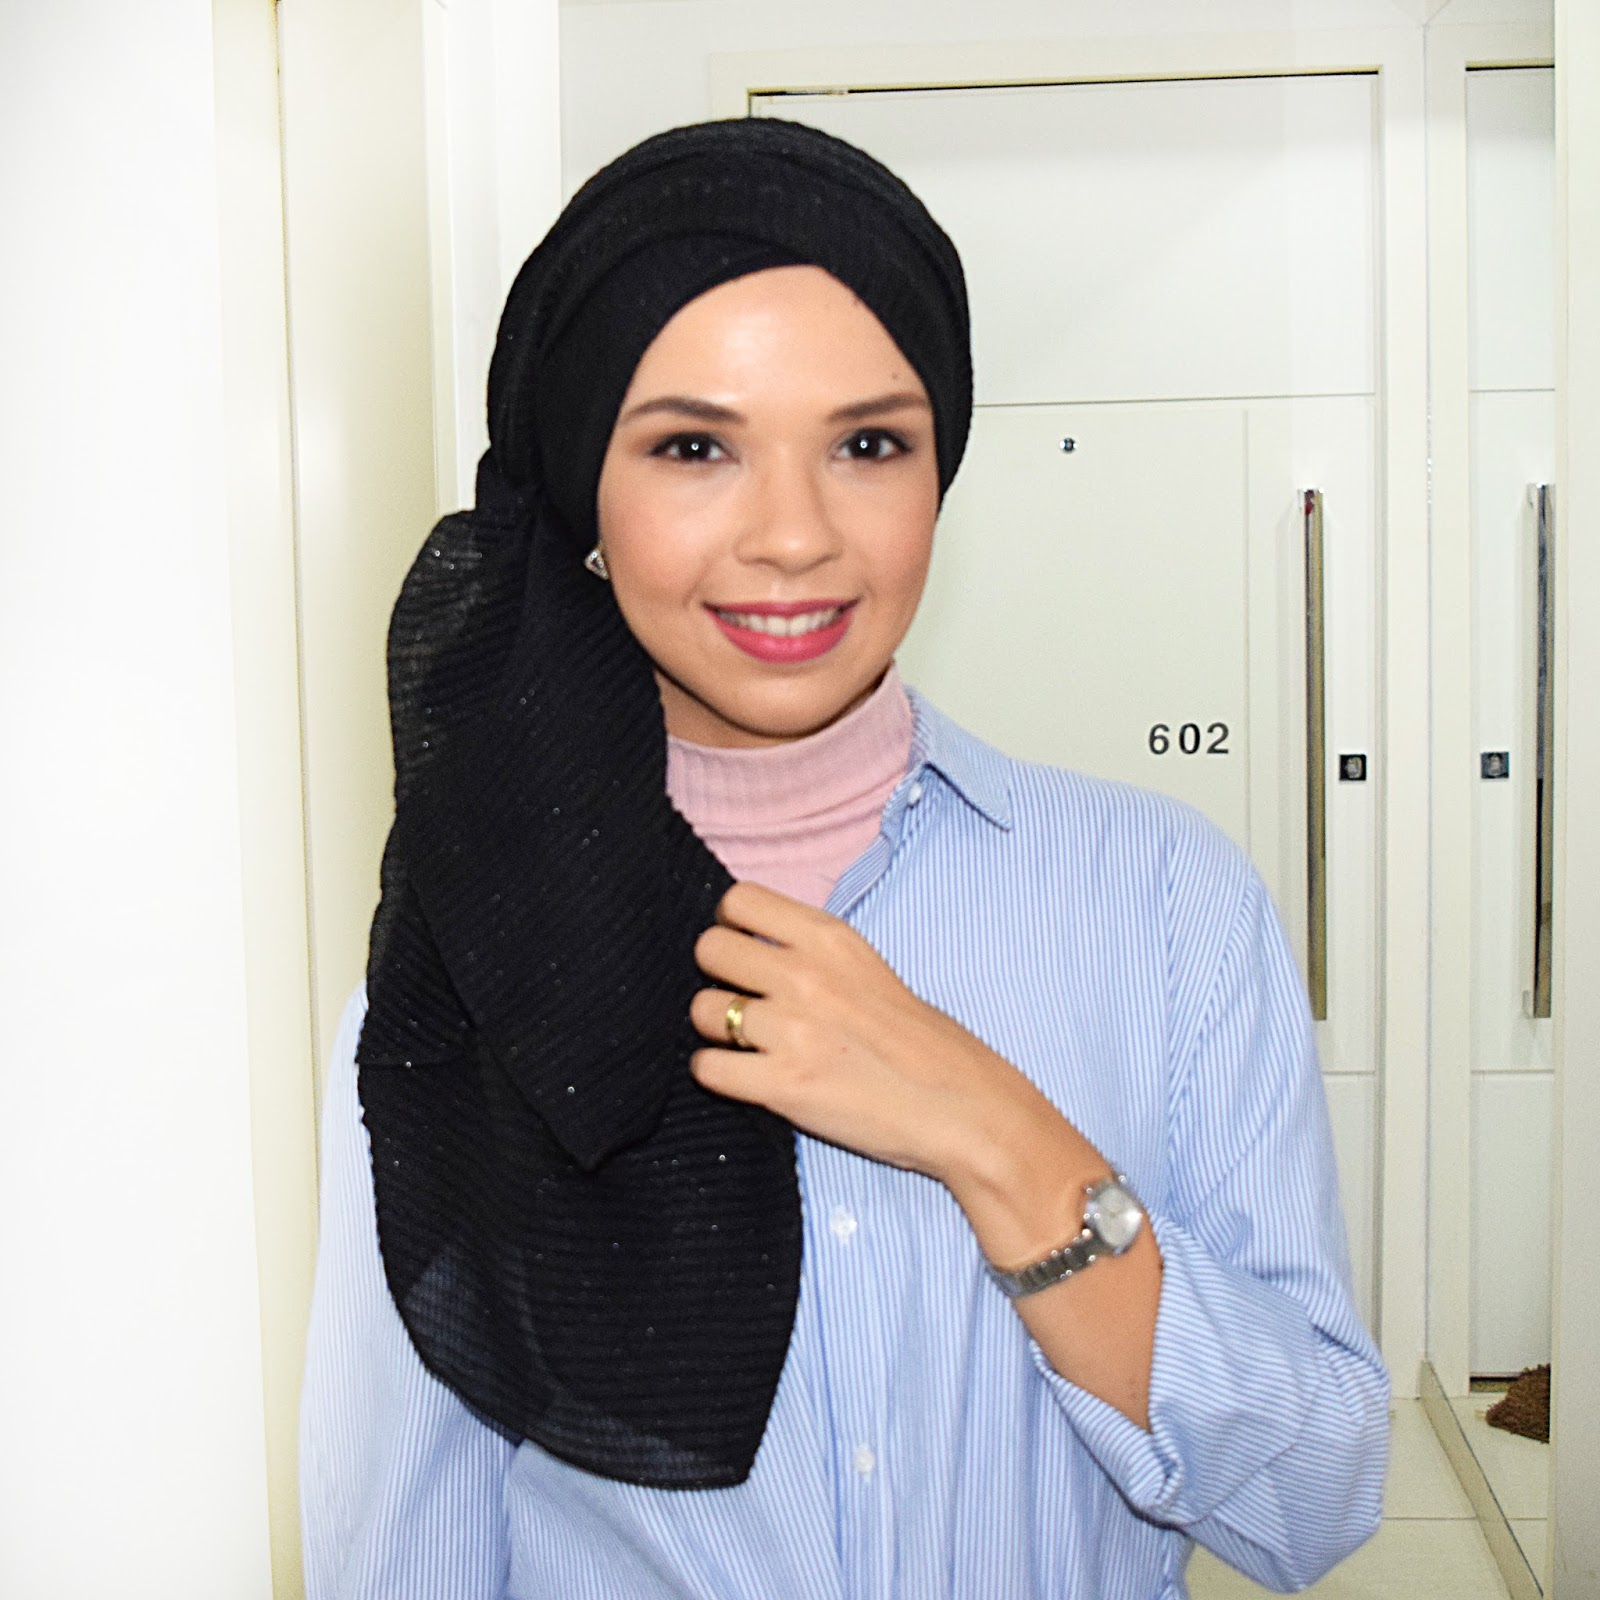 hijab, turban, modest fashion, zara, trend, ootd, minimalist, style